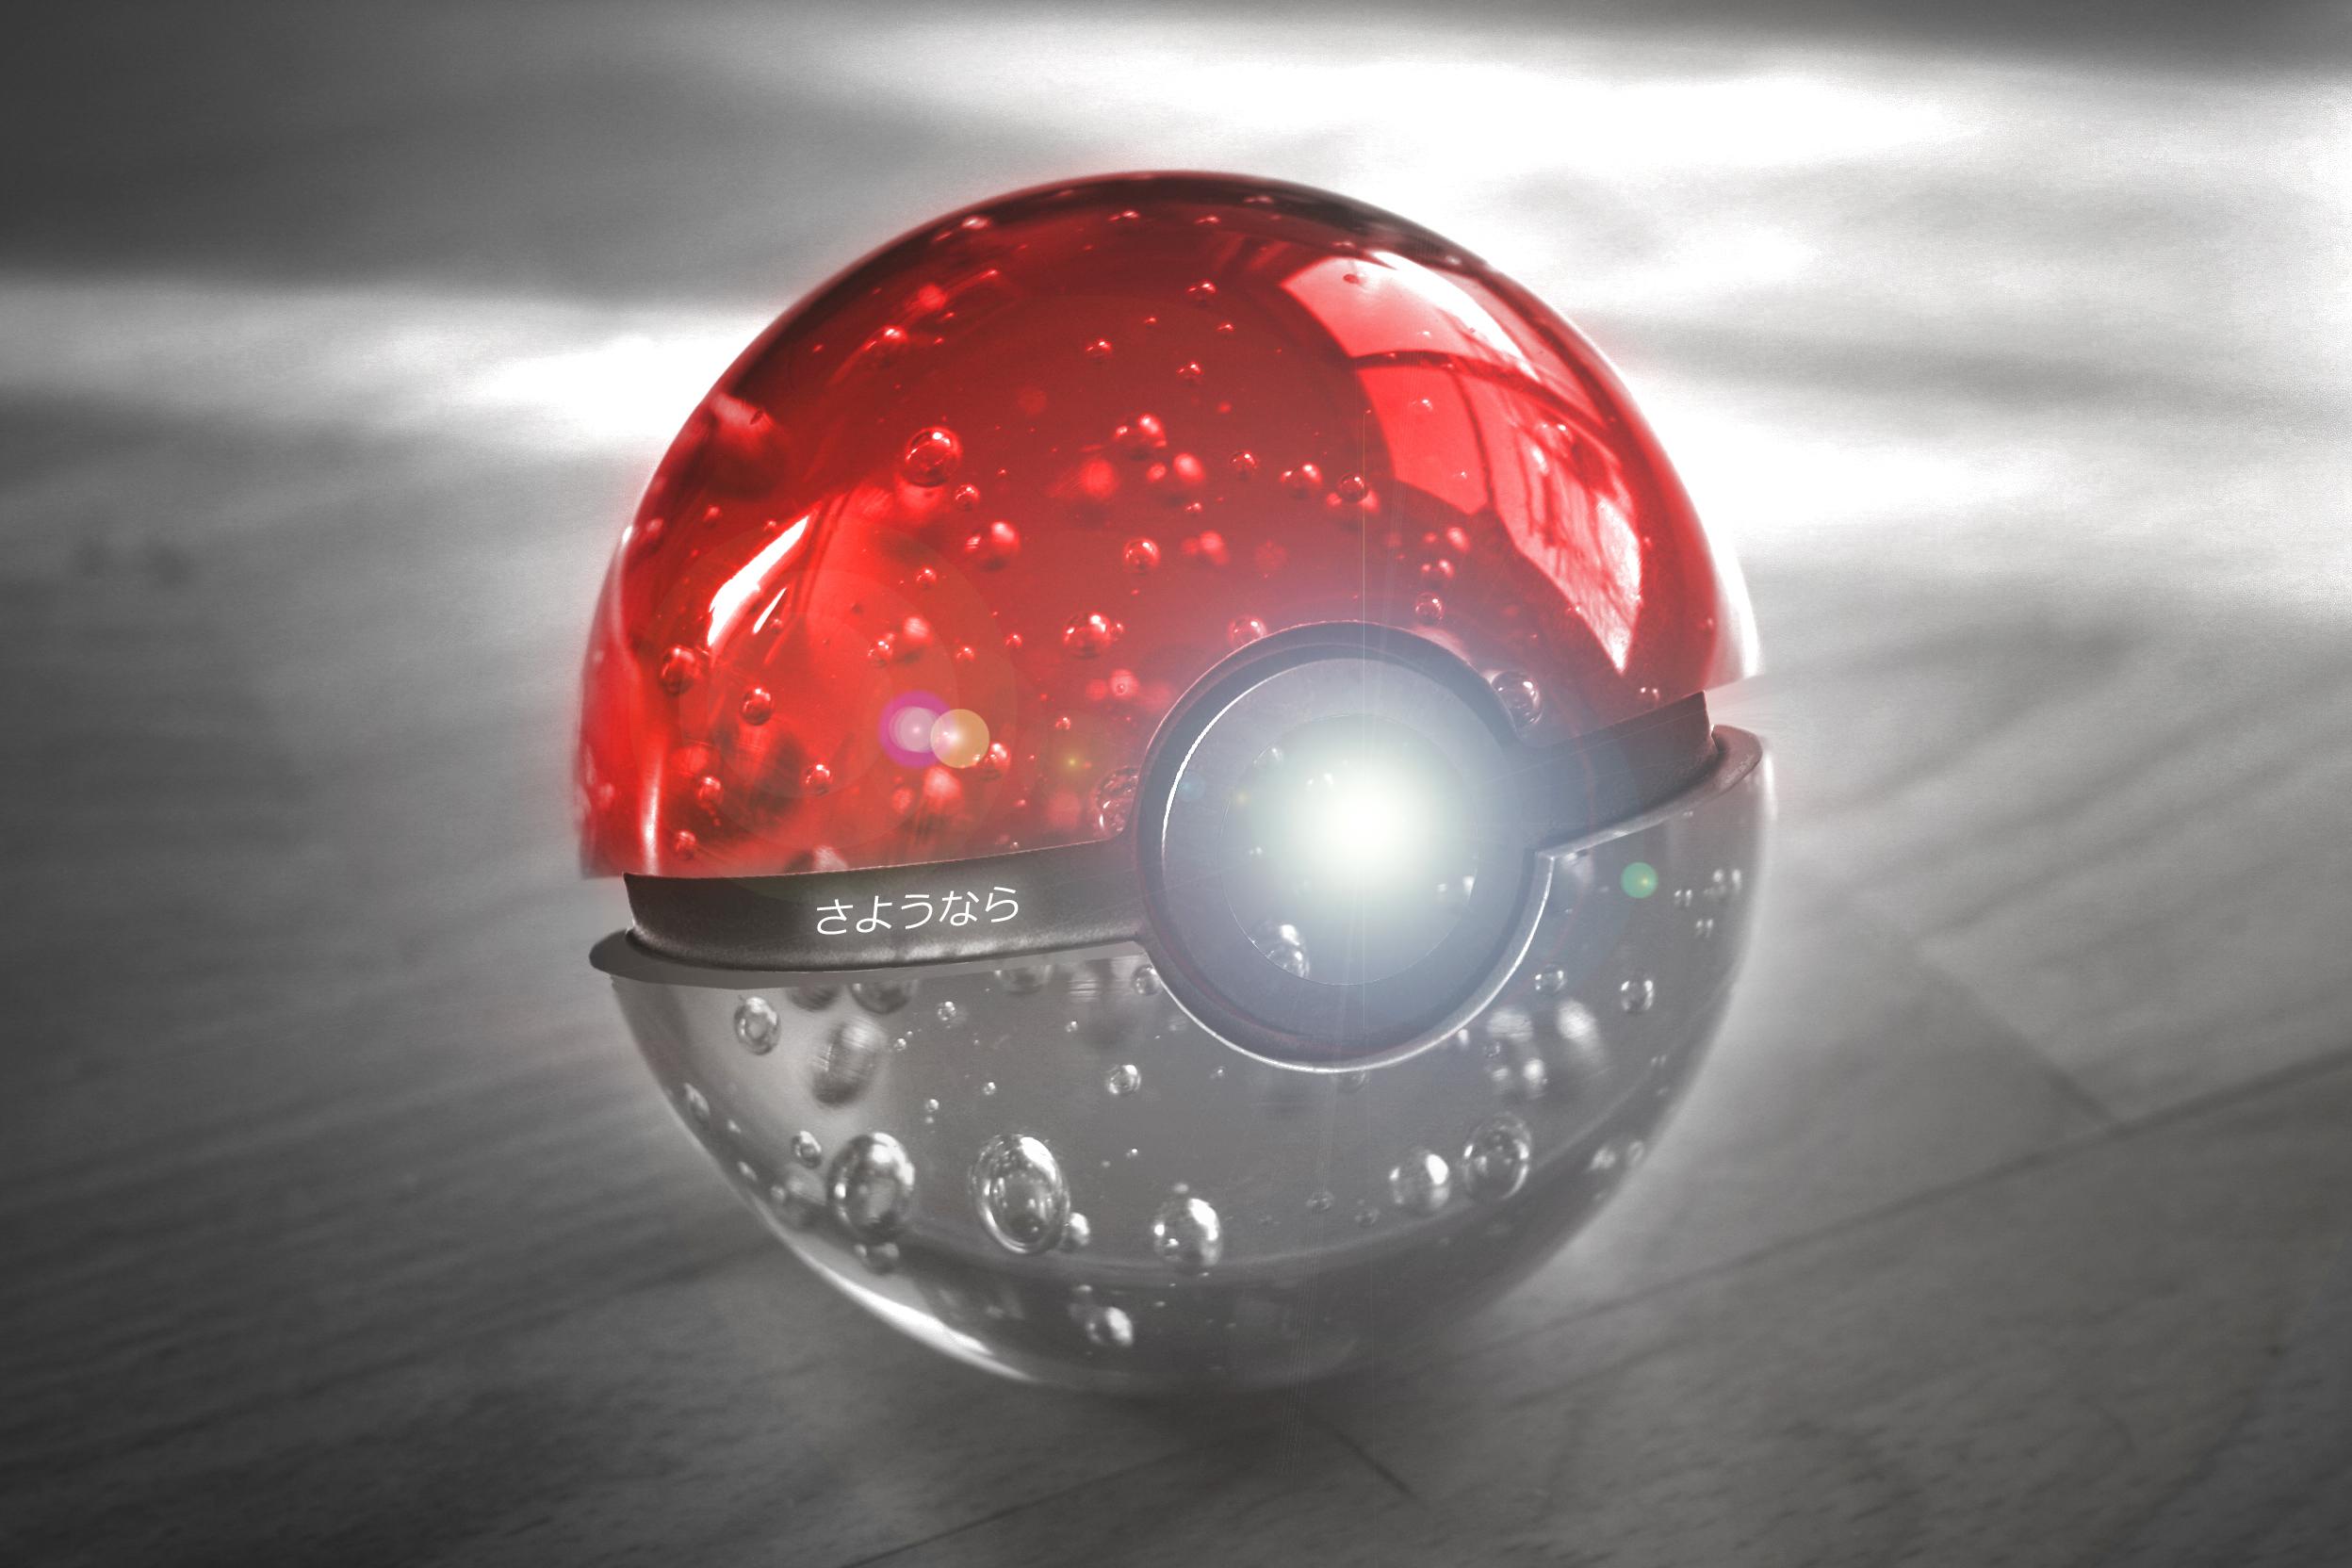 Fondos De Pantalla Rojo Vehículo Esfera Pokemon